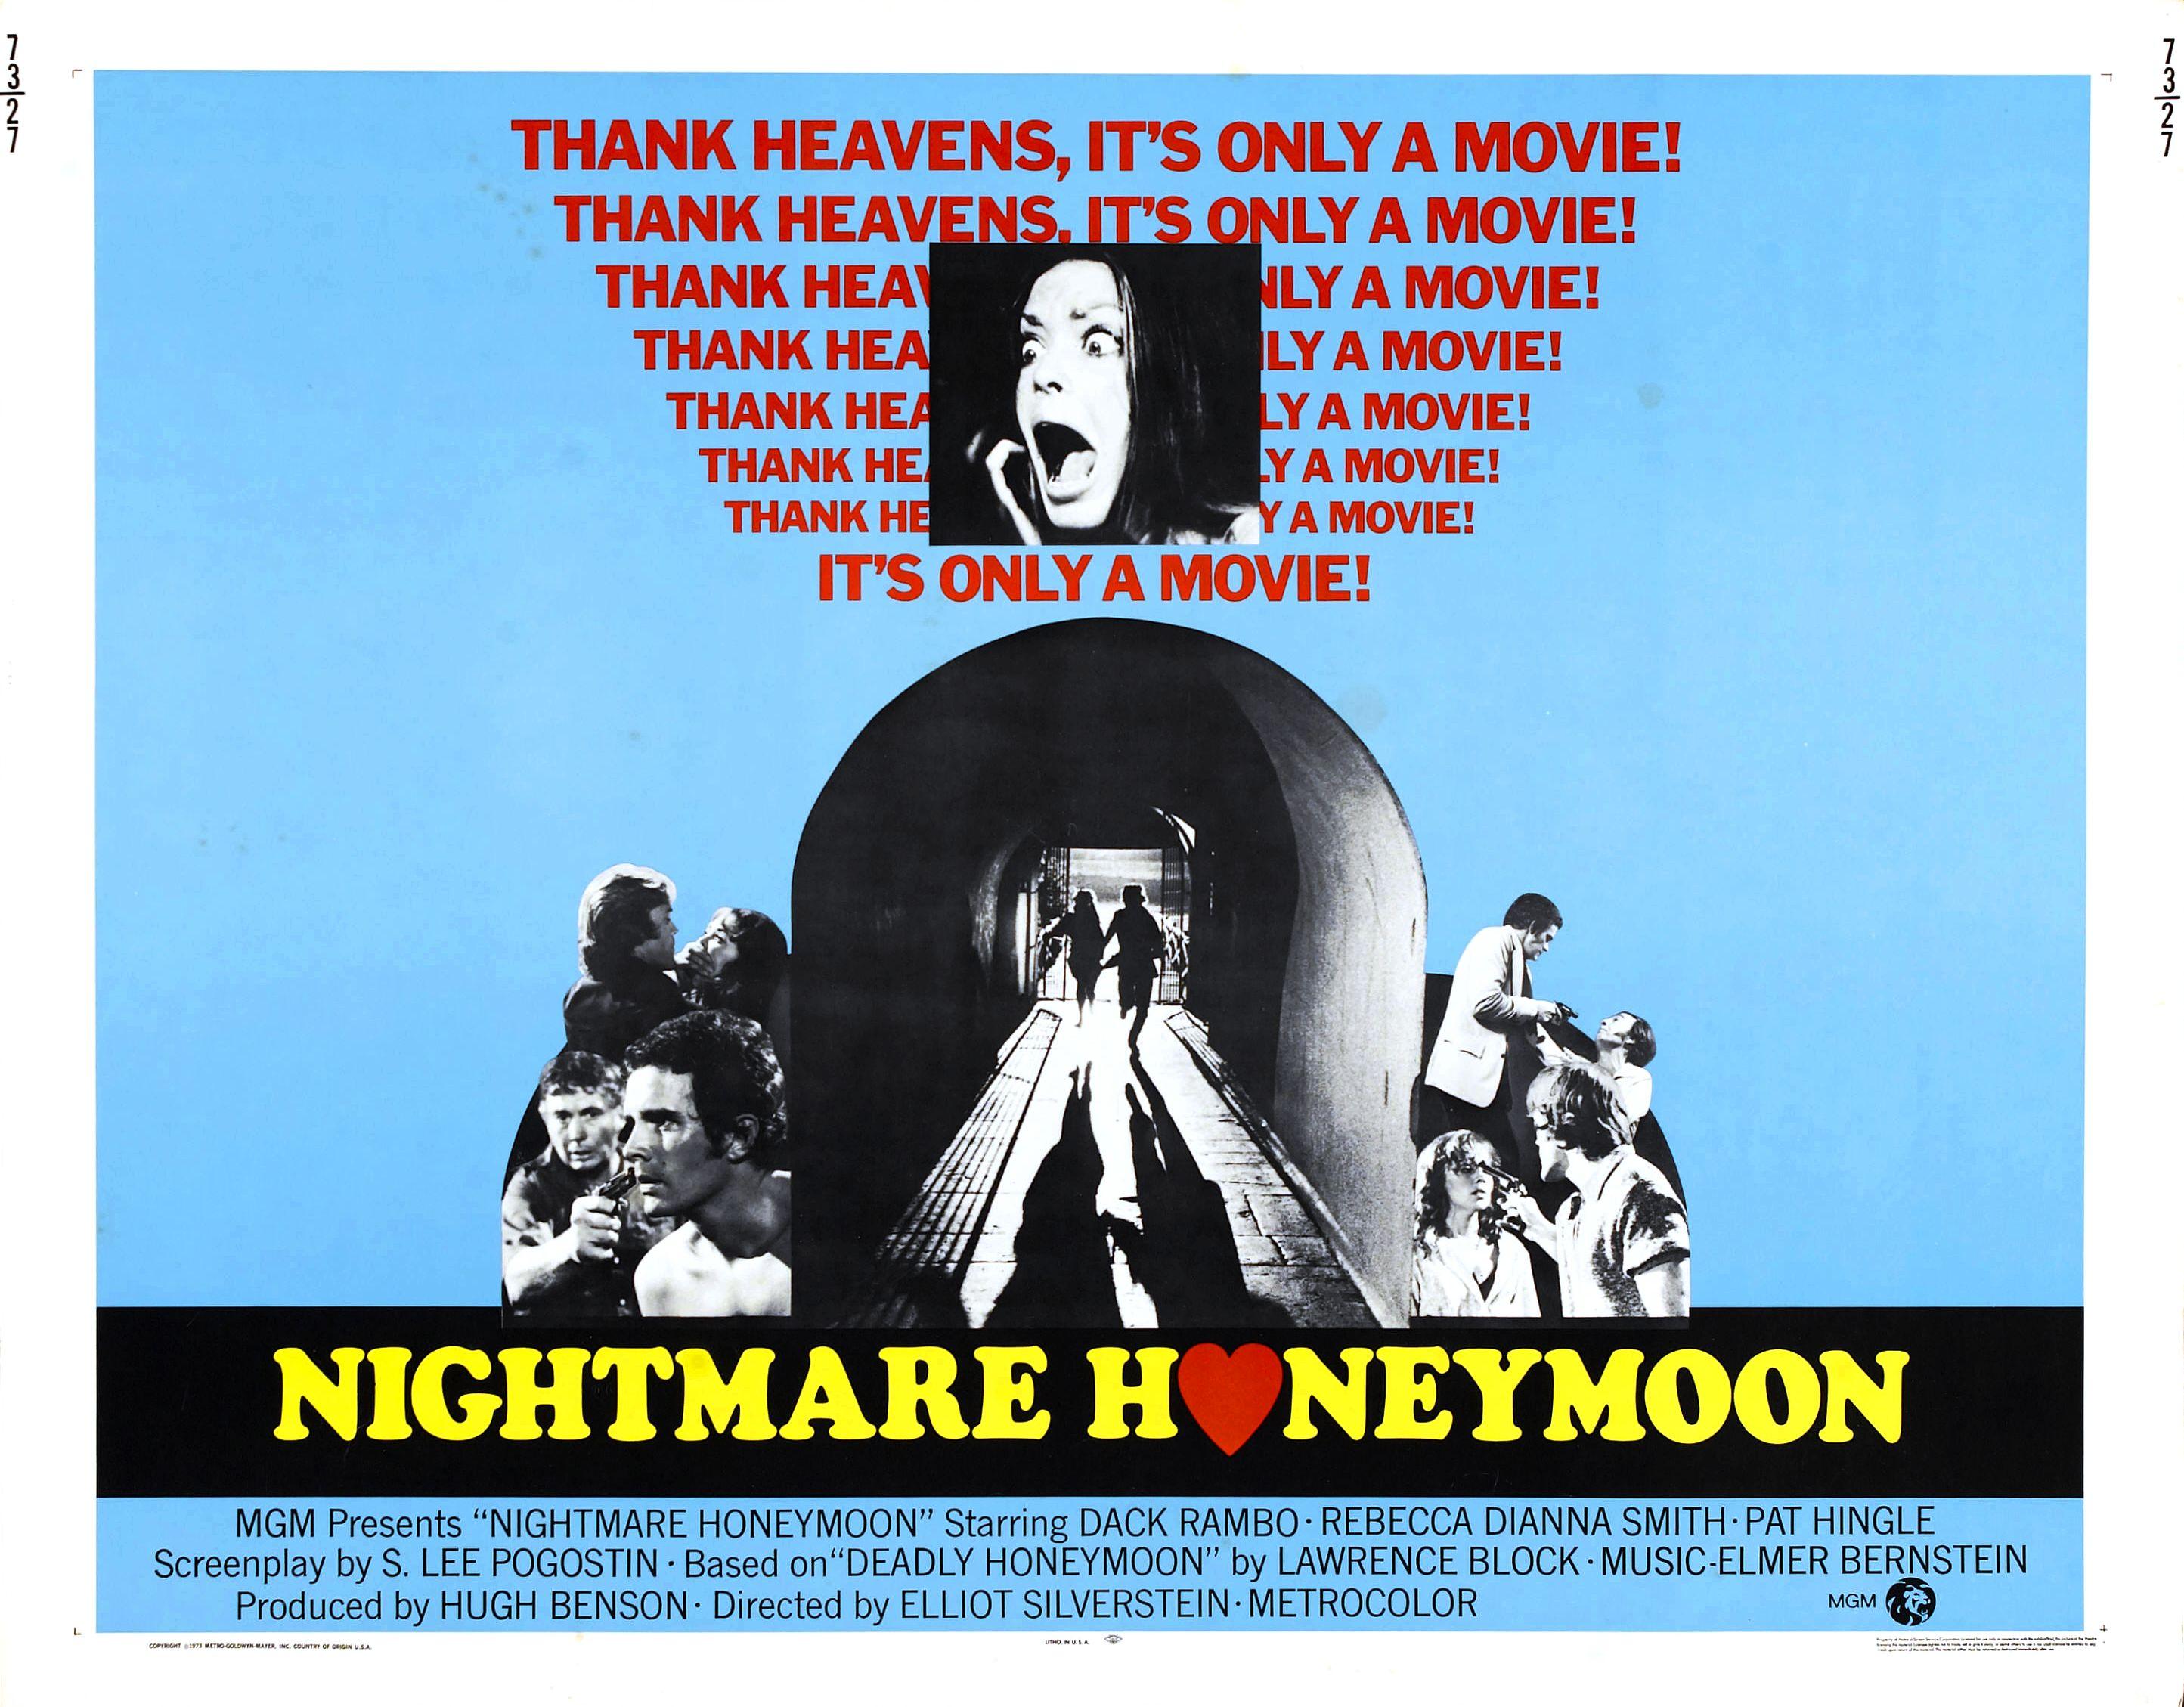 Nightmare Honeymoon